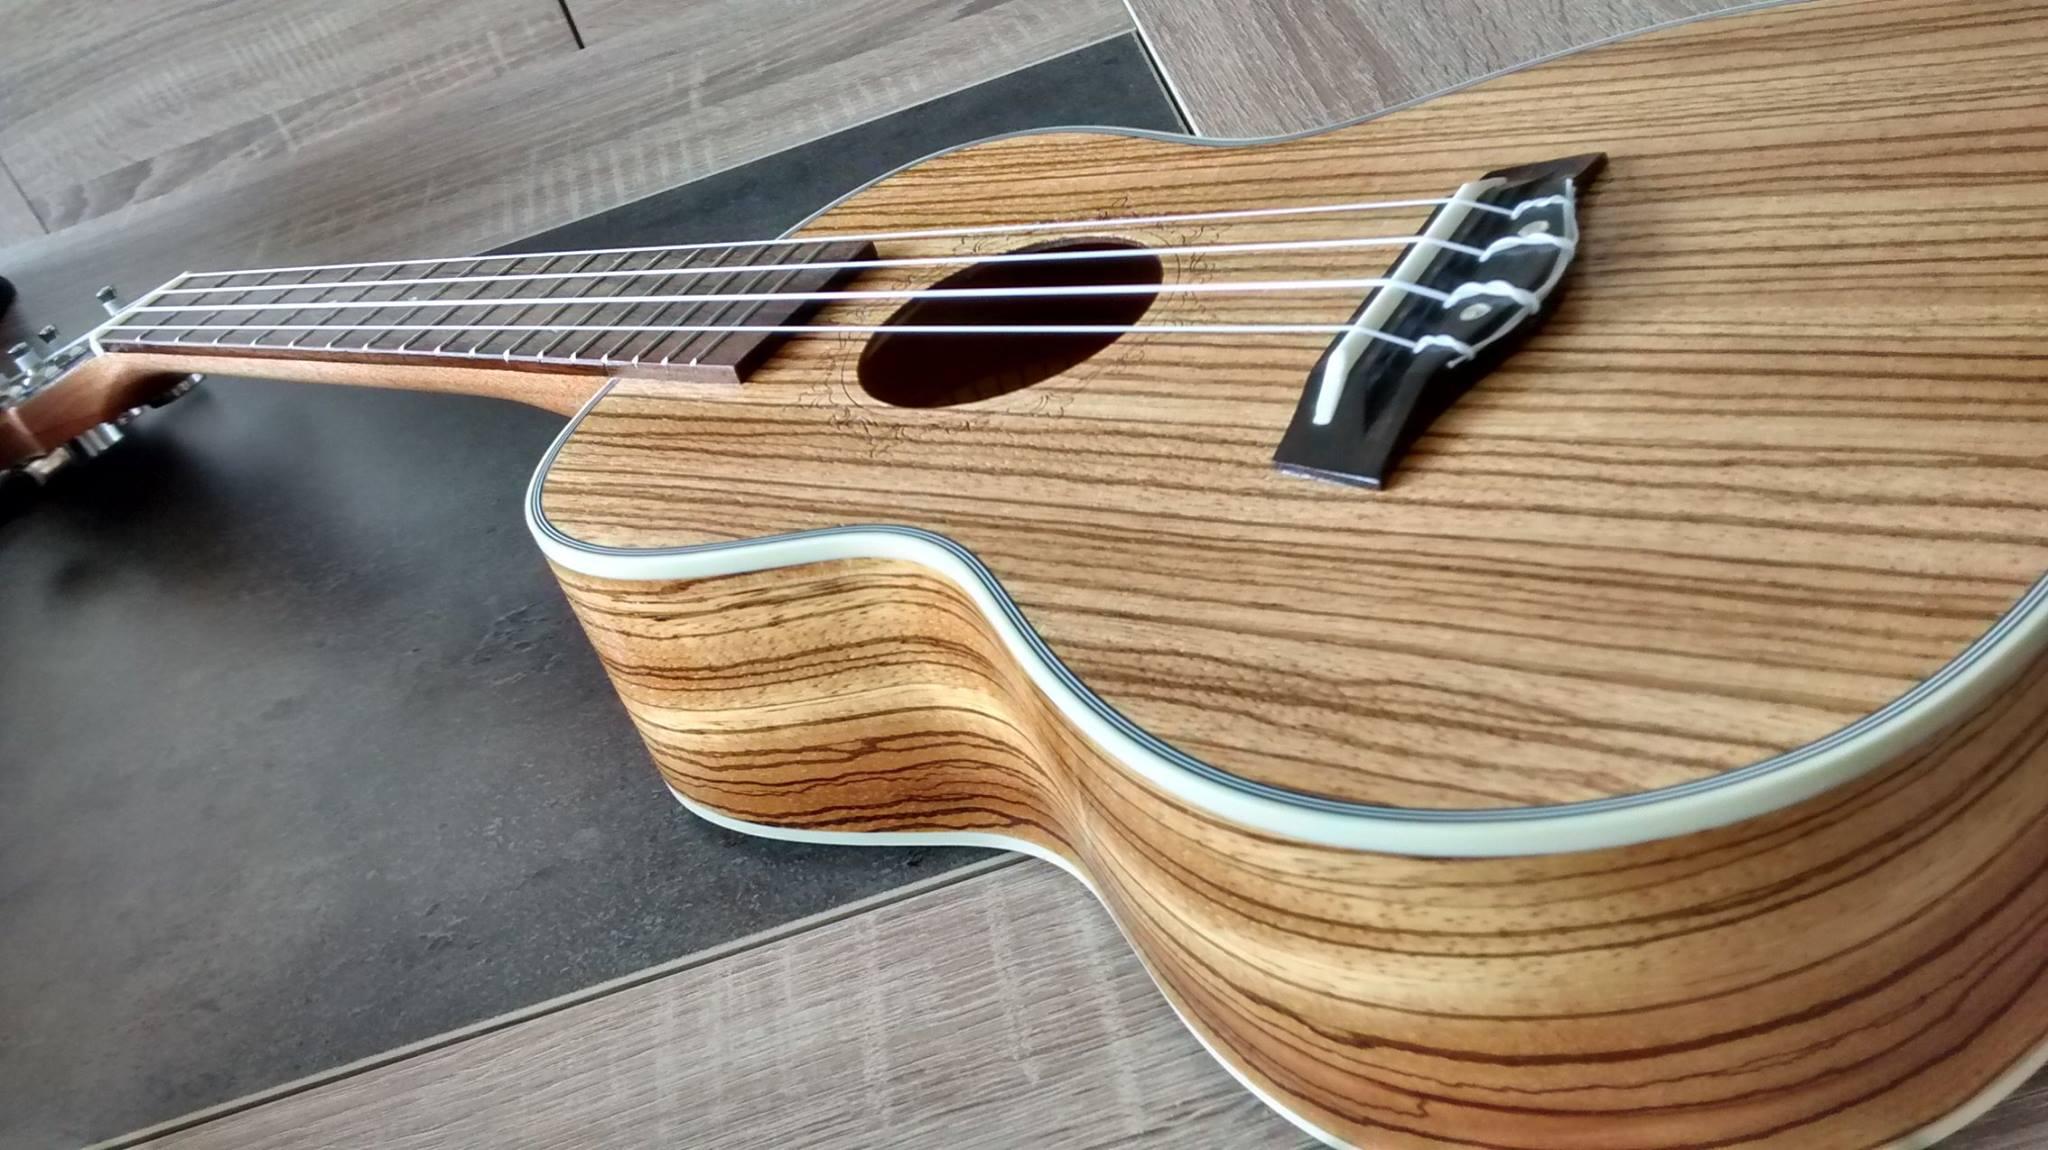 ukulele vidar ru 135 - 1